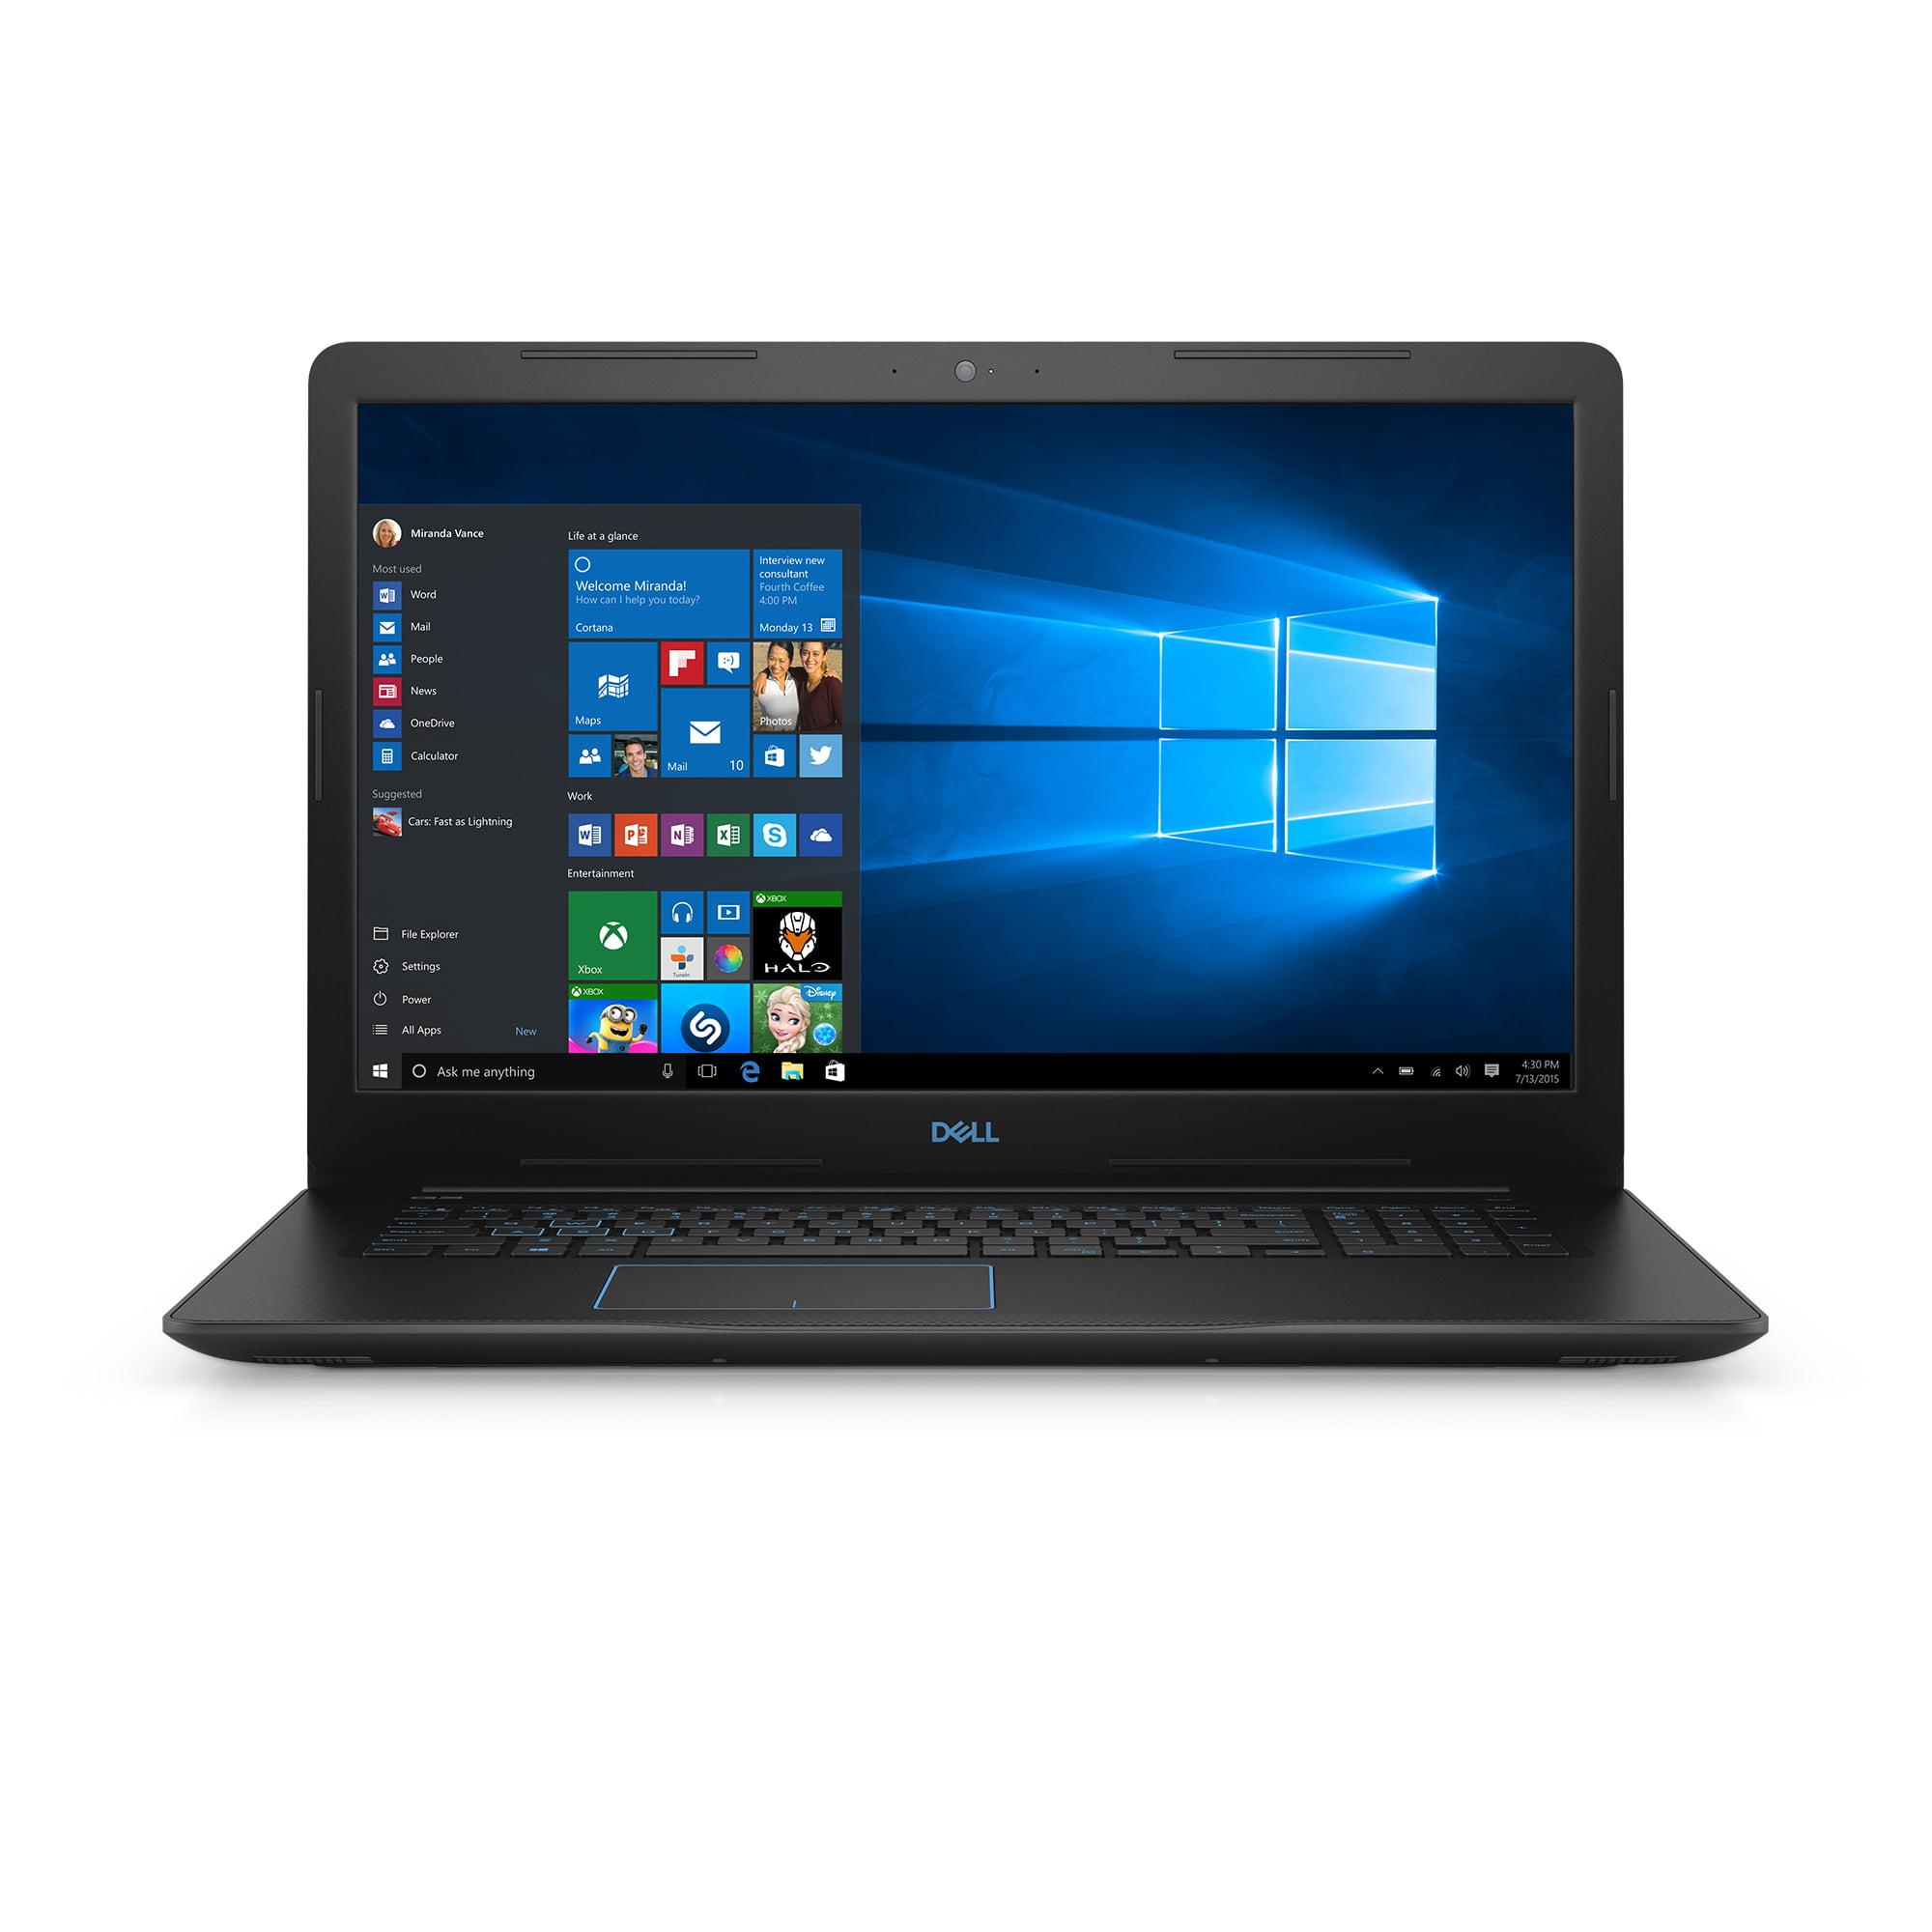 "Dell inspiron 15 5000 series 15. 6"" hd laptop, intel core i7-7500u."